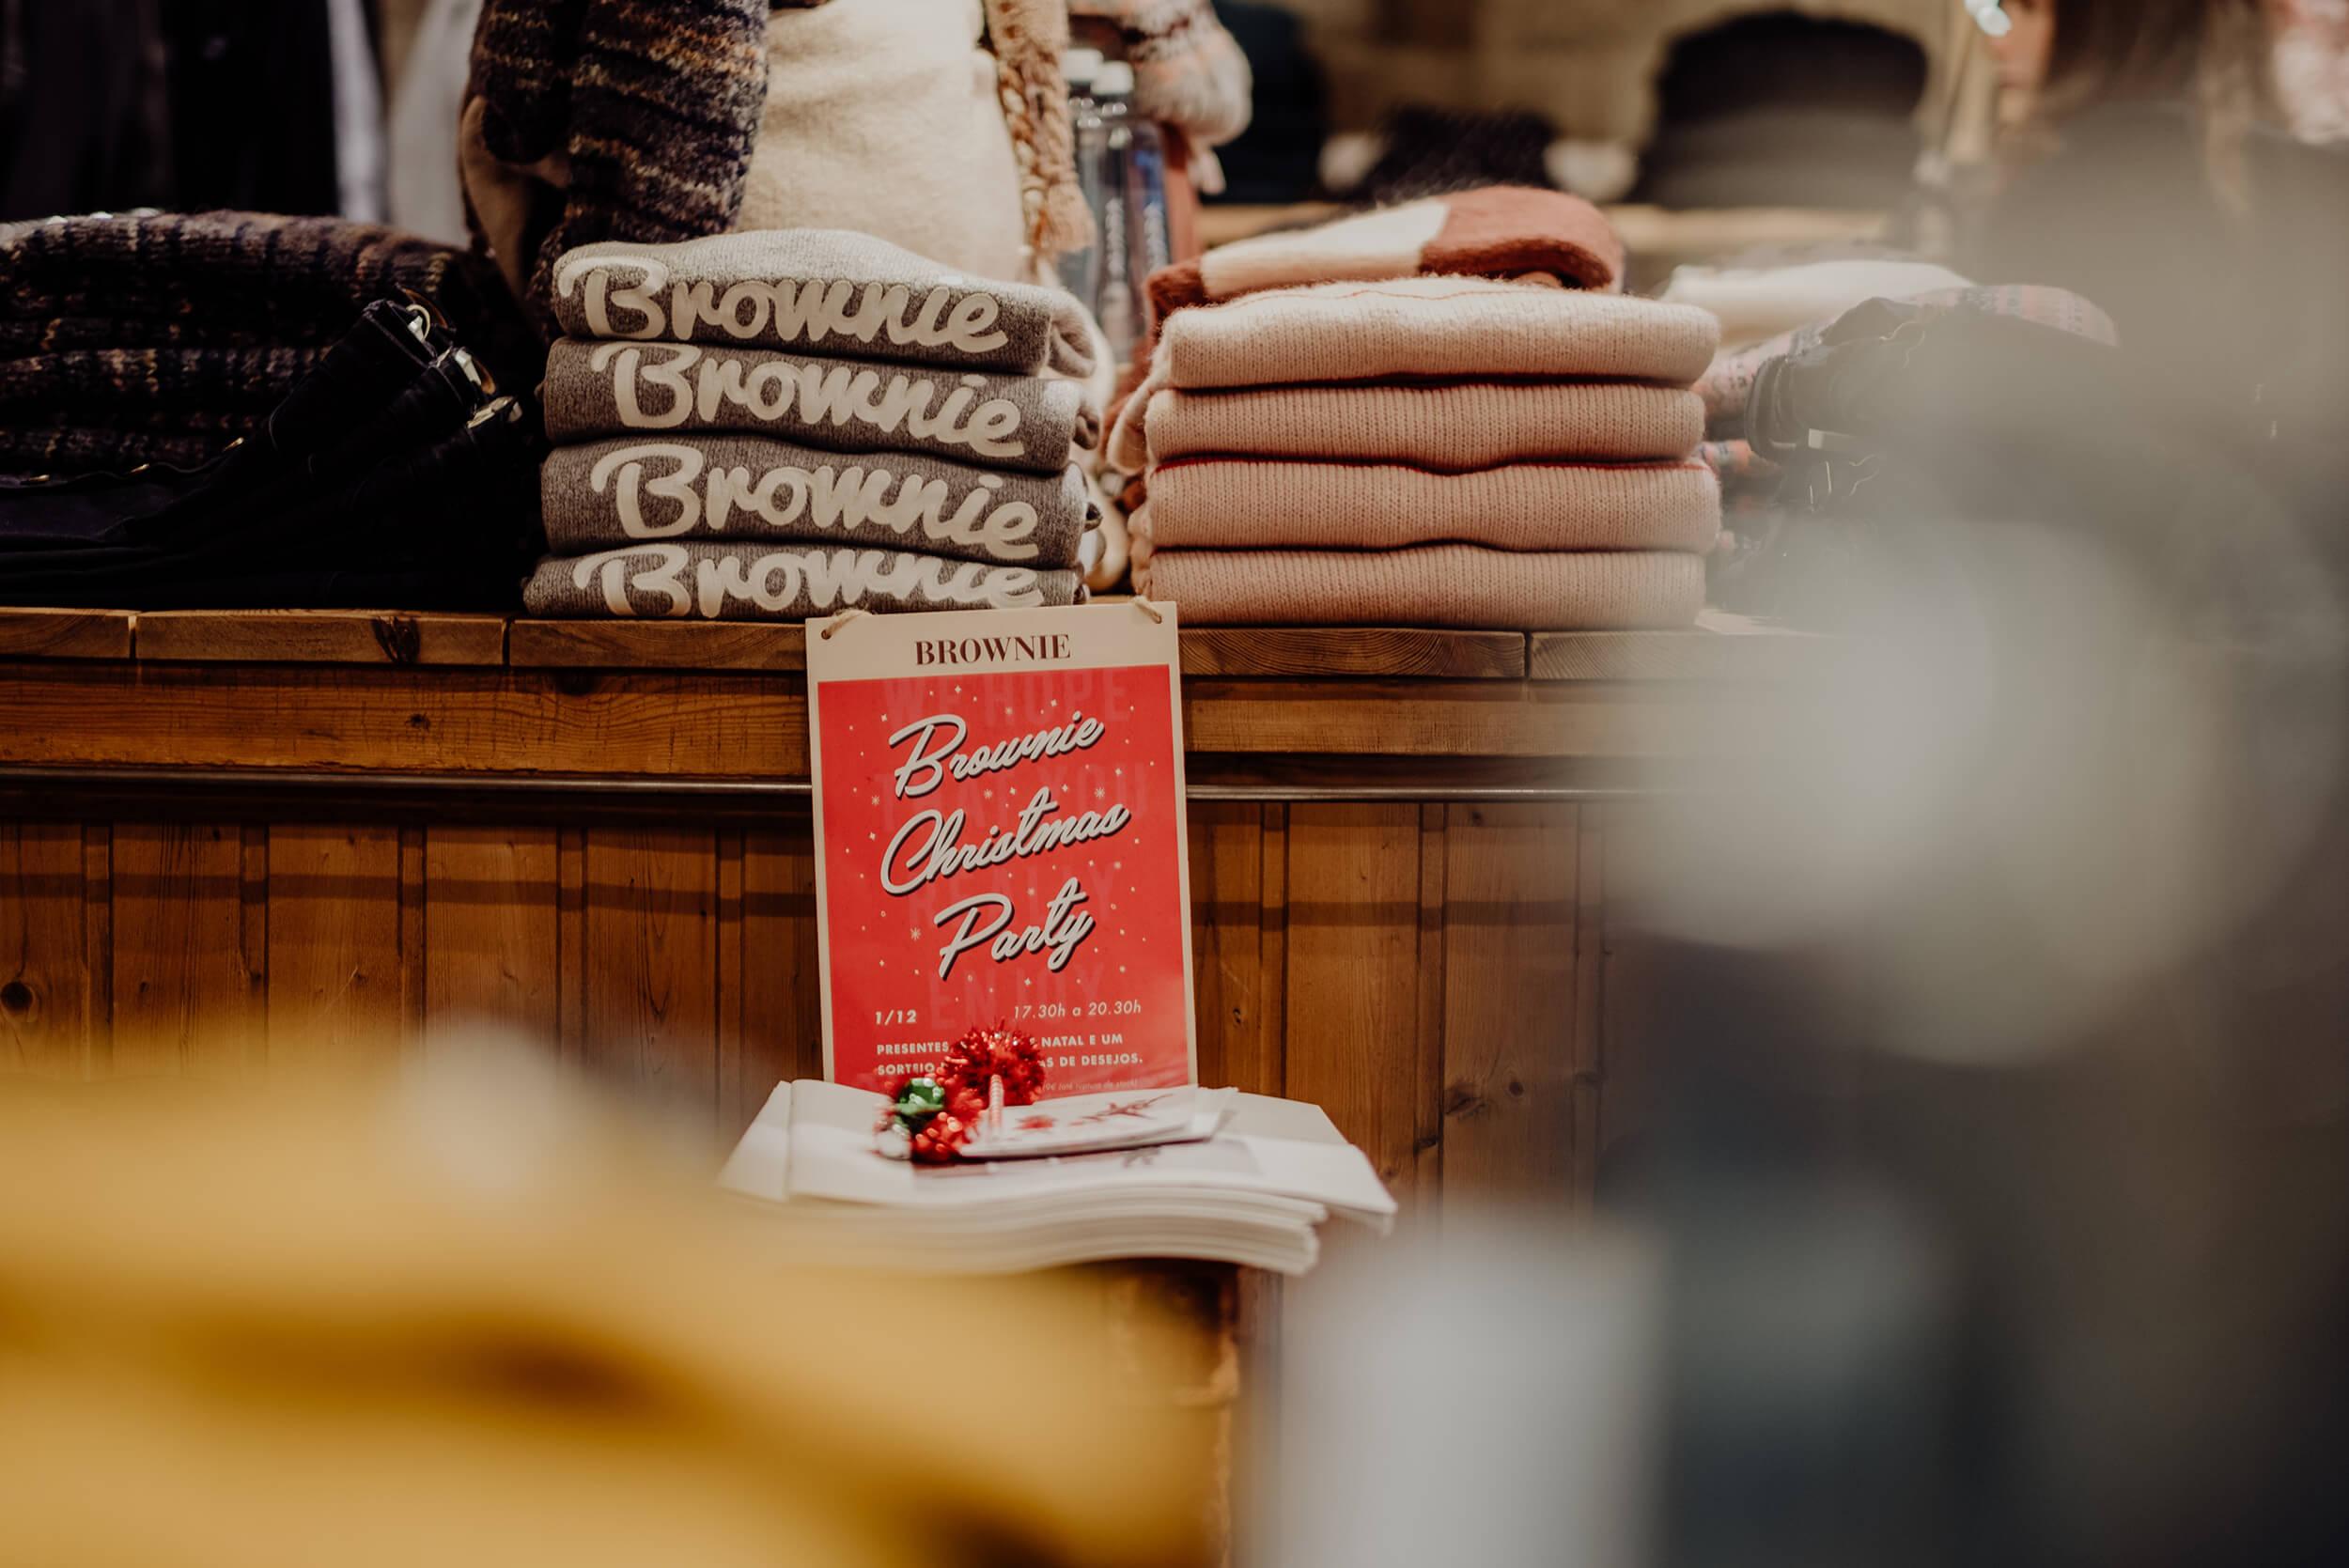 roma-organizacao-eventos-festa-de-natal-loja-brownie-27